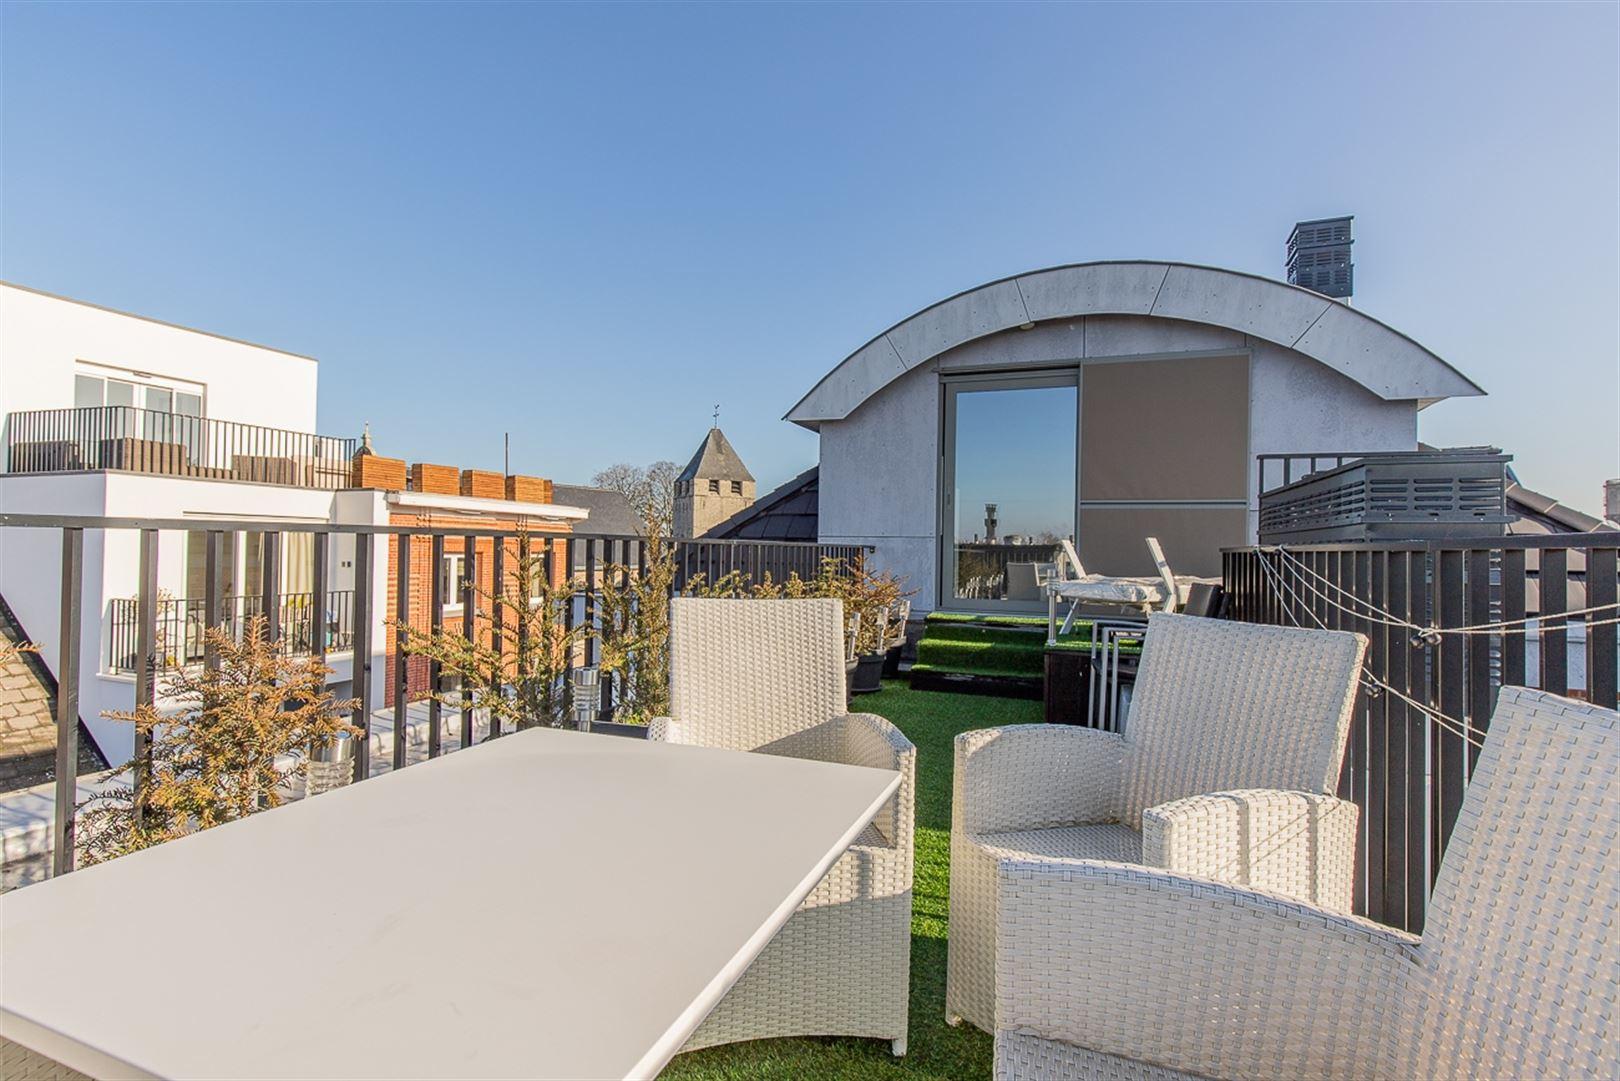 Foto 18 : Duplex/Penthouse te 9200 DENDERMONDE (België) - Prijs € 399.000